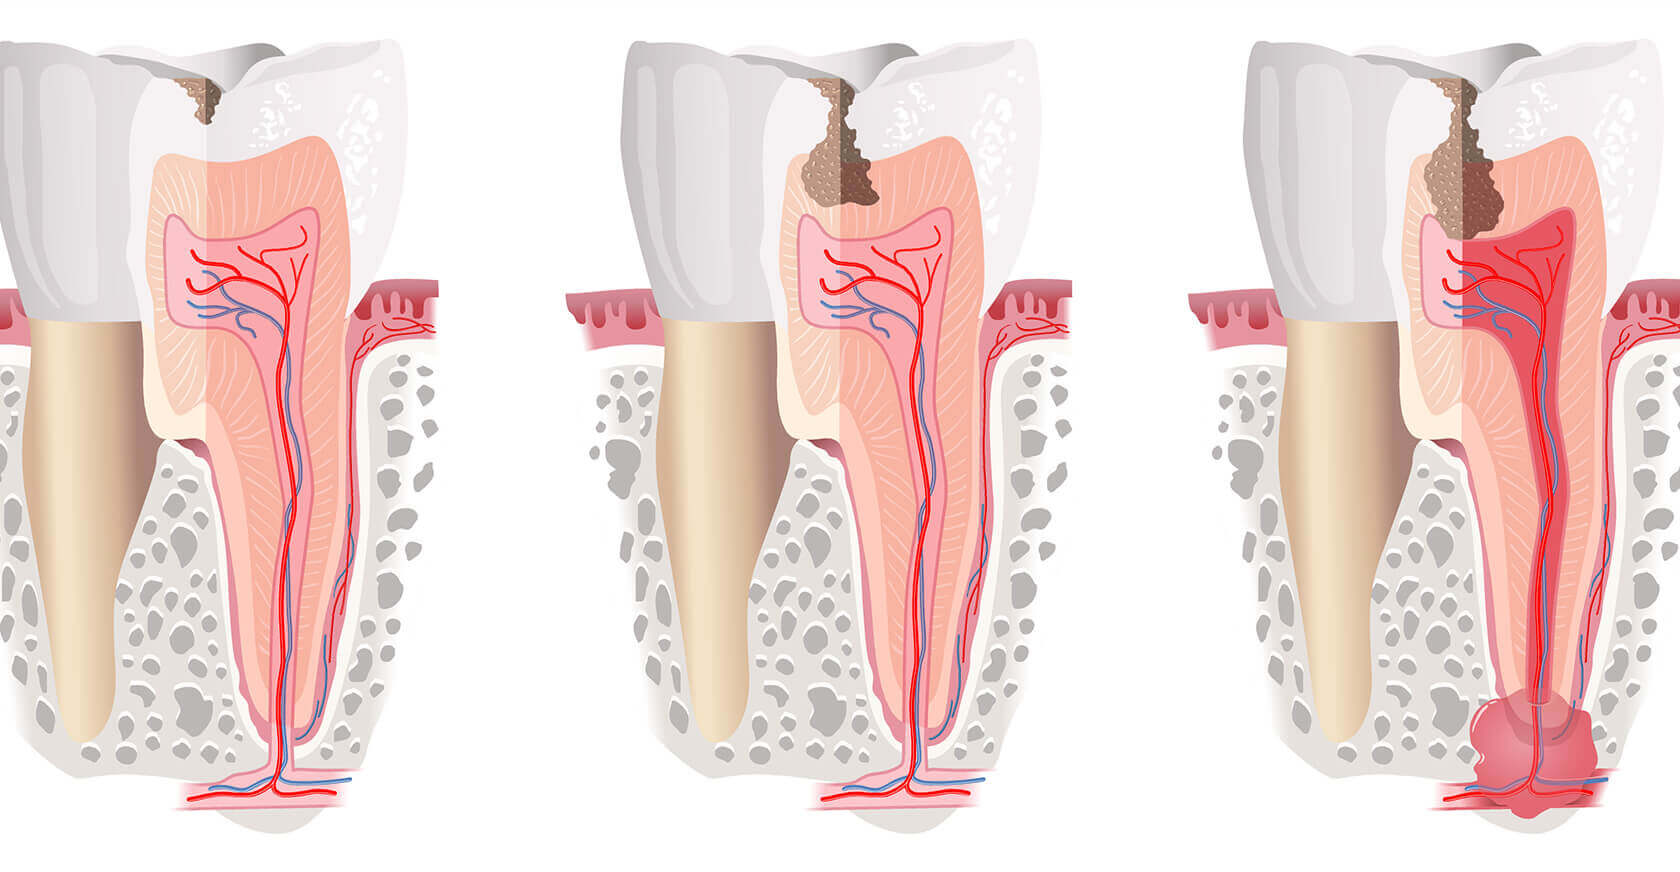 Odontoiatria Conservativa Centro Dentale Parmense | Dentisti in Parma